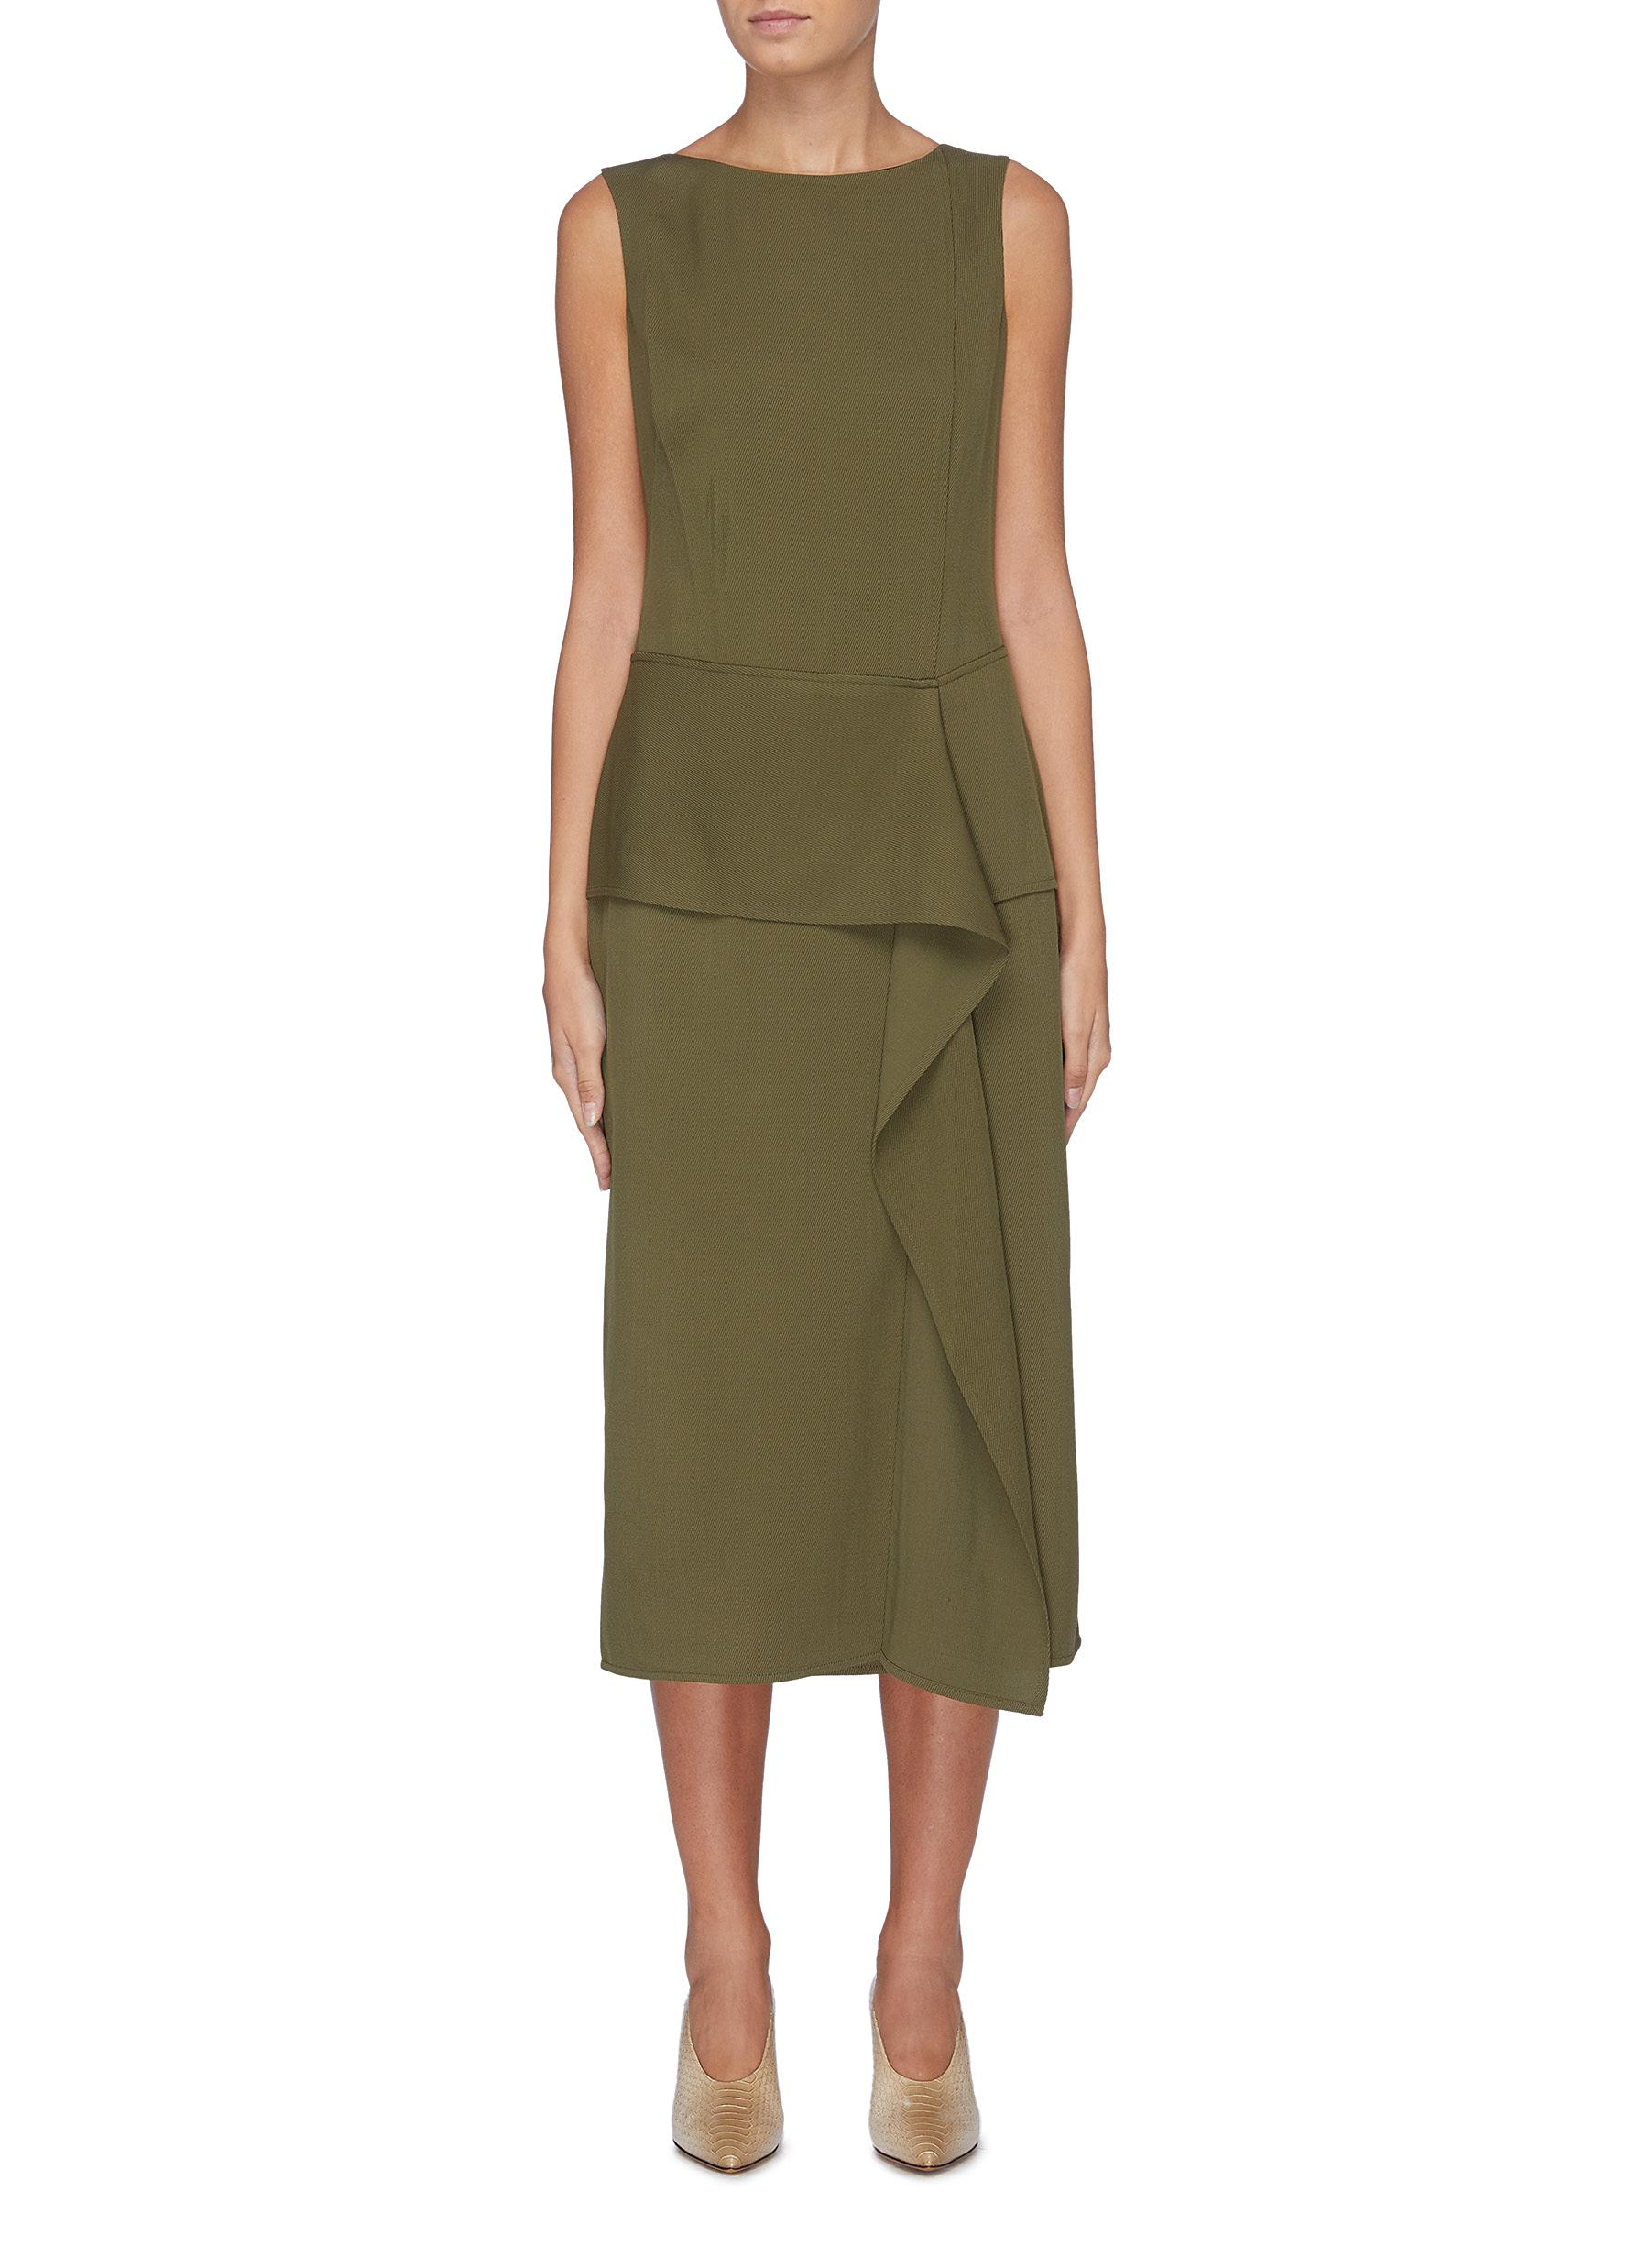 Drape panel sleeveless dress by Victoria Beckham